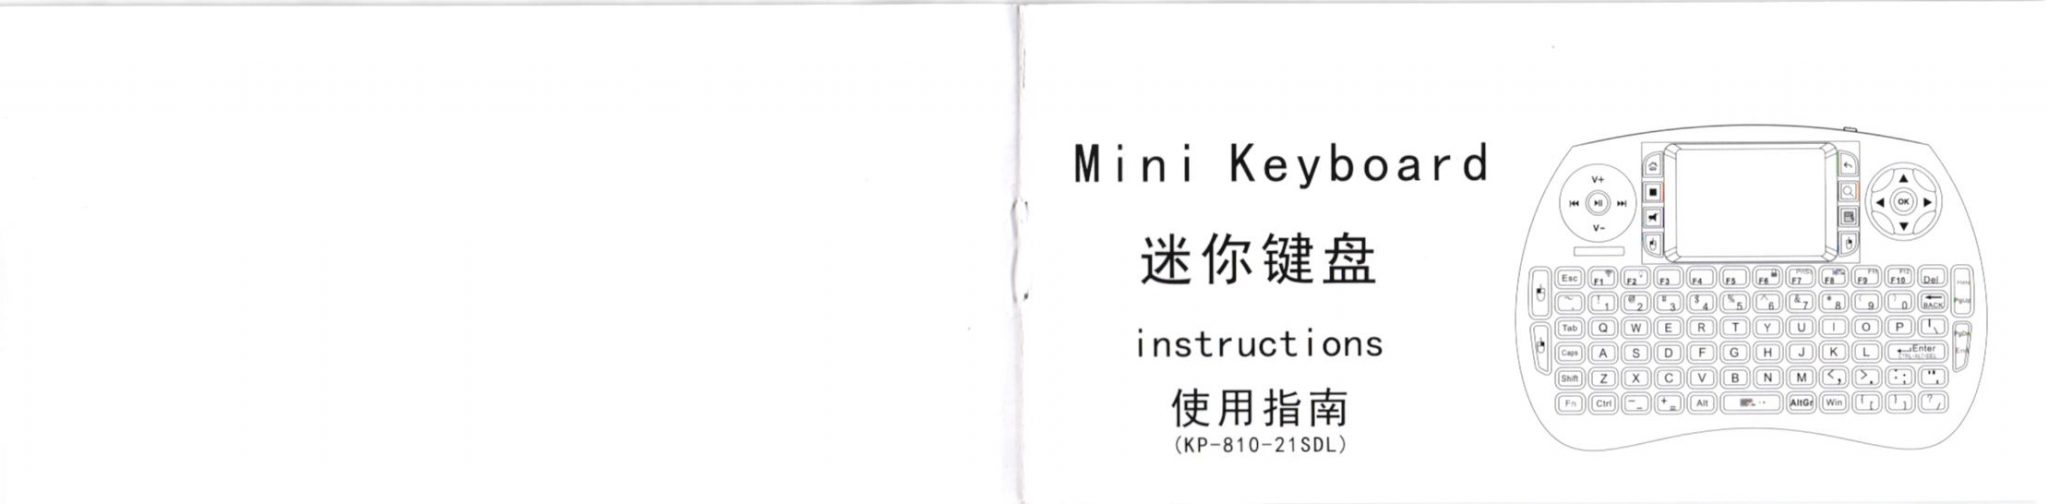 iPazzPort Mini Keyboard 取説 1